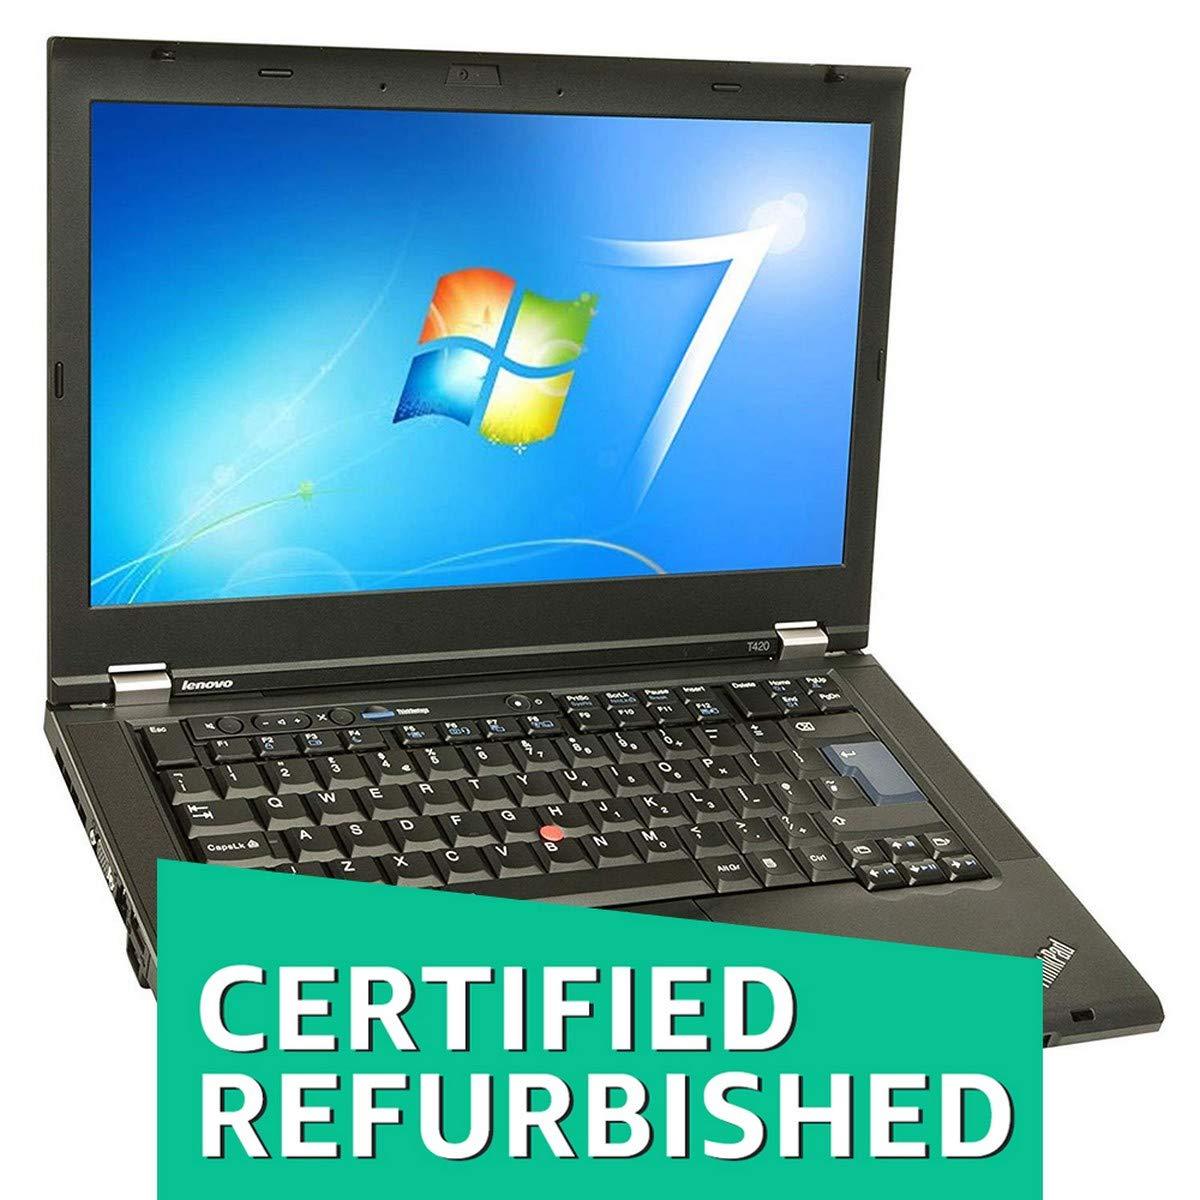 (Certified REFURBISHED) Lenovo Thinkpad T420-16 GB-128 GB